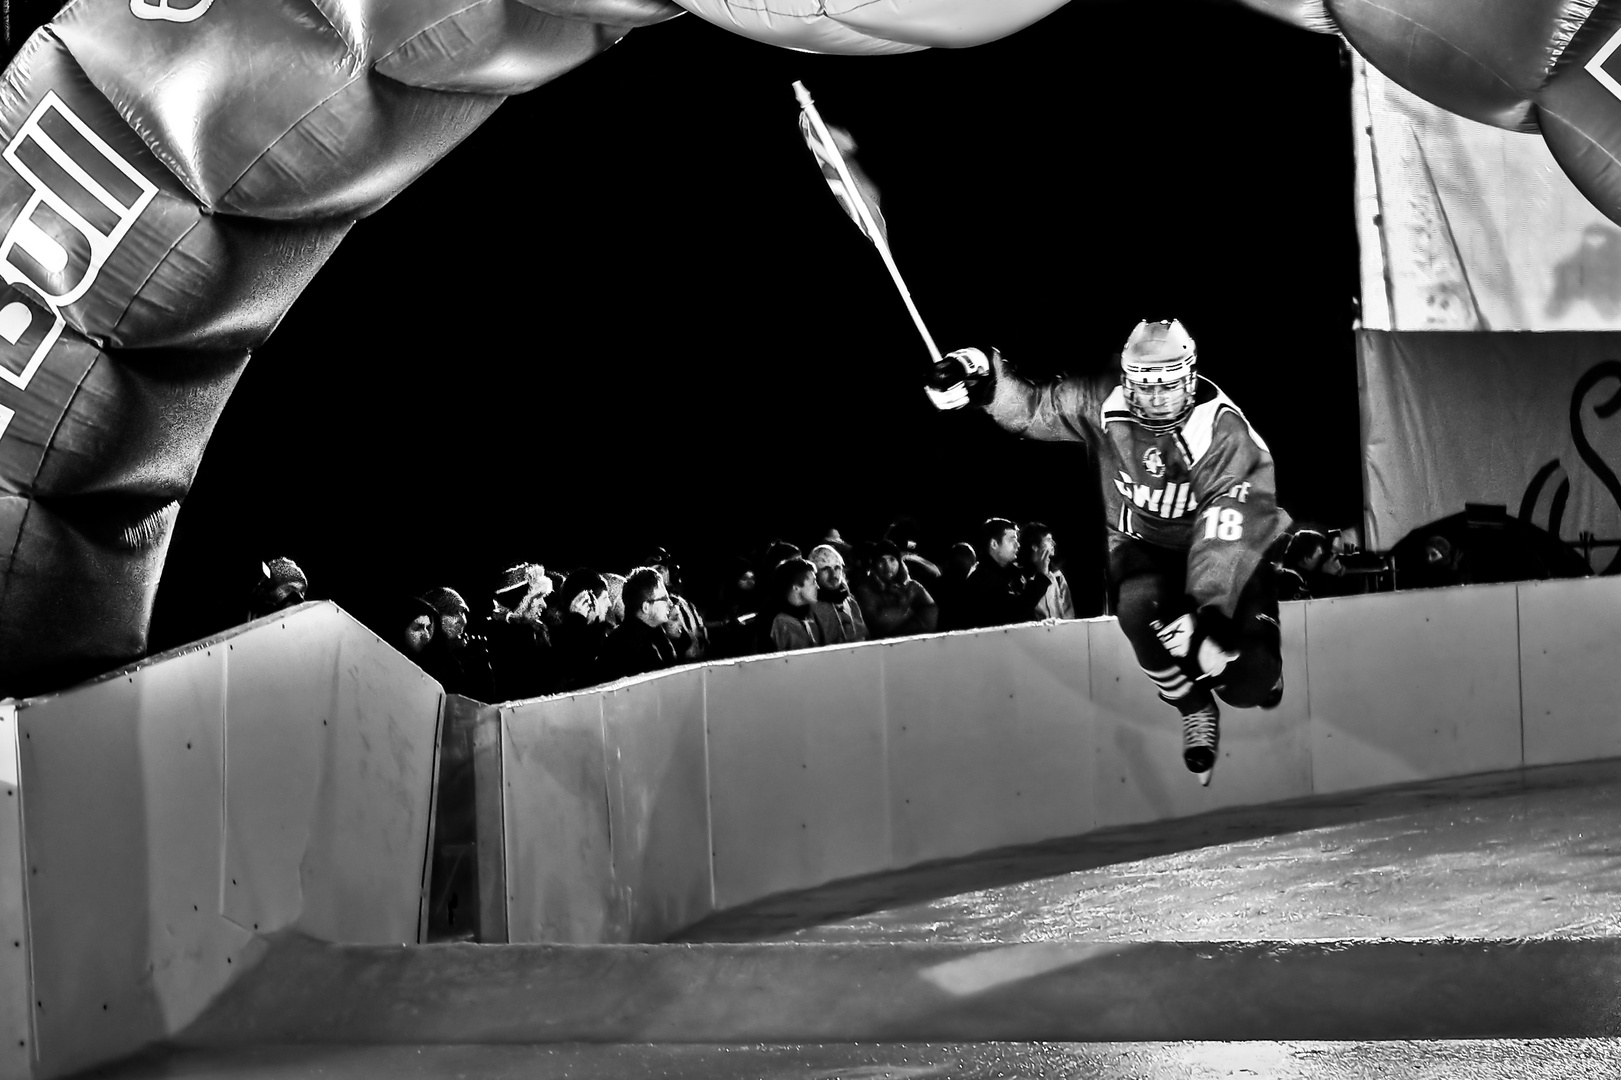 Red Bull Crashed Ice II - So High